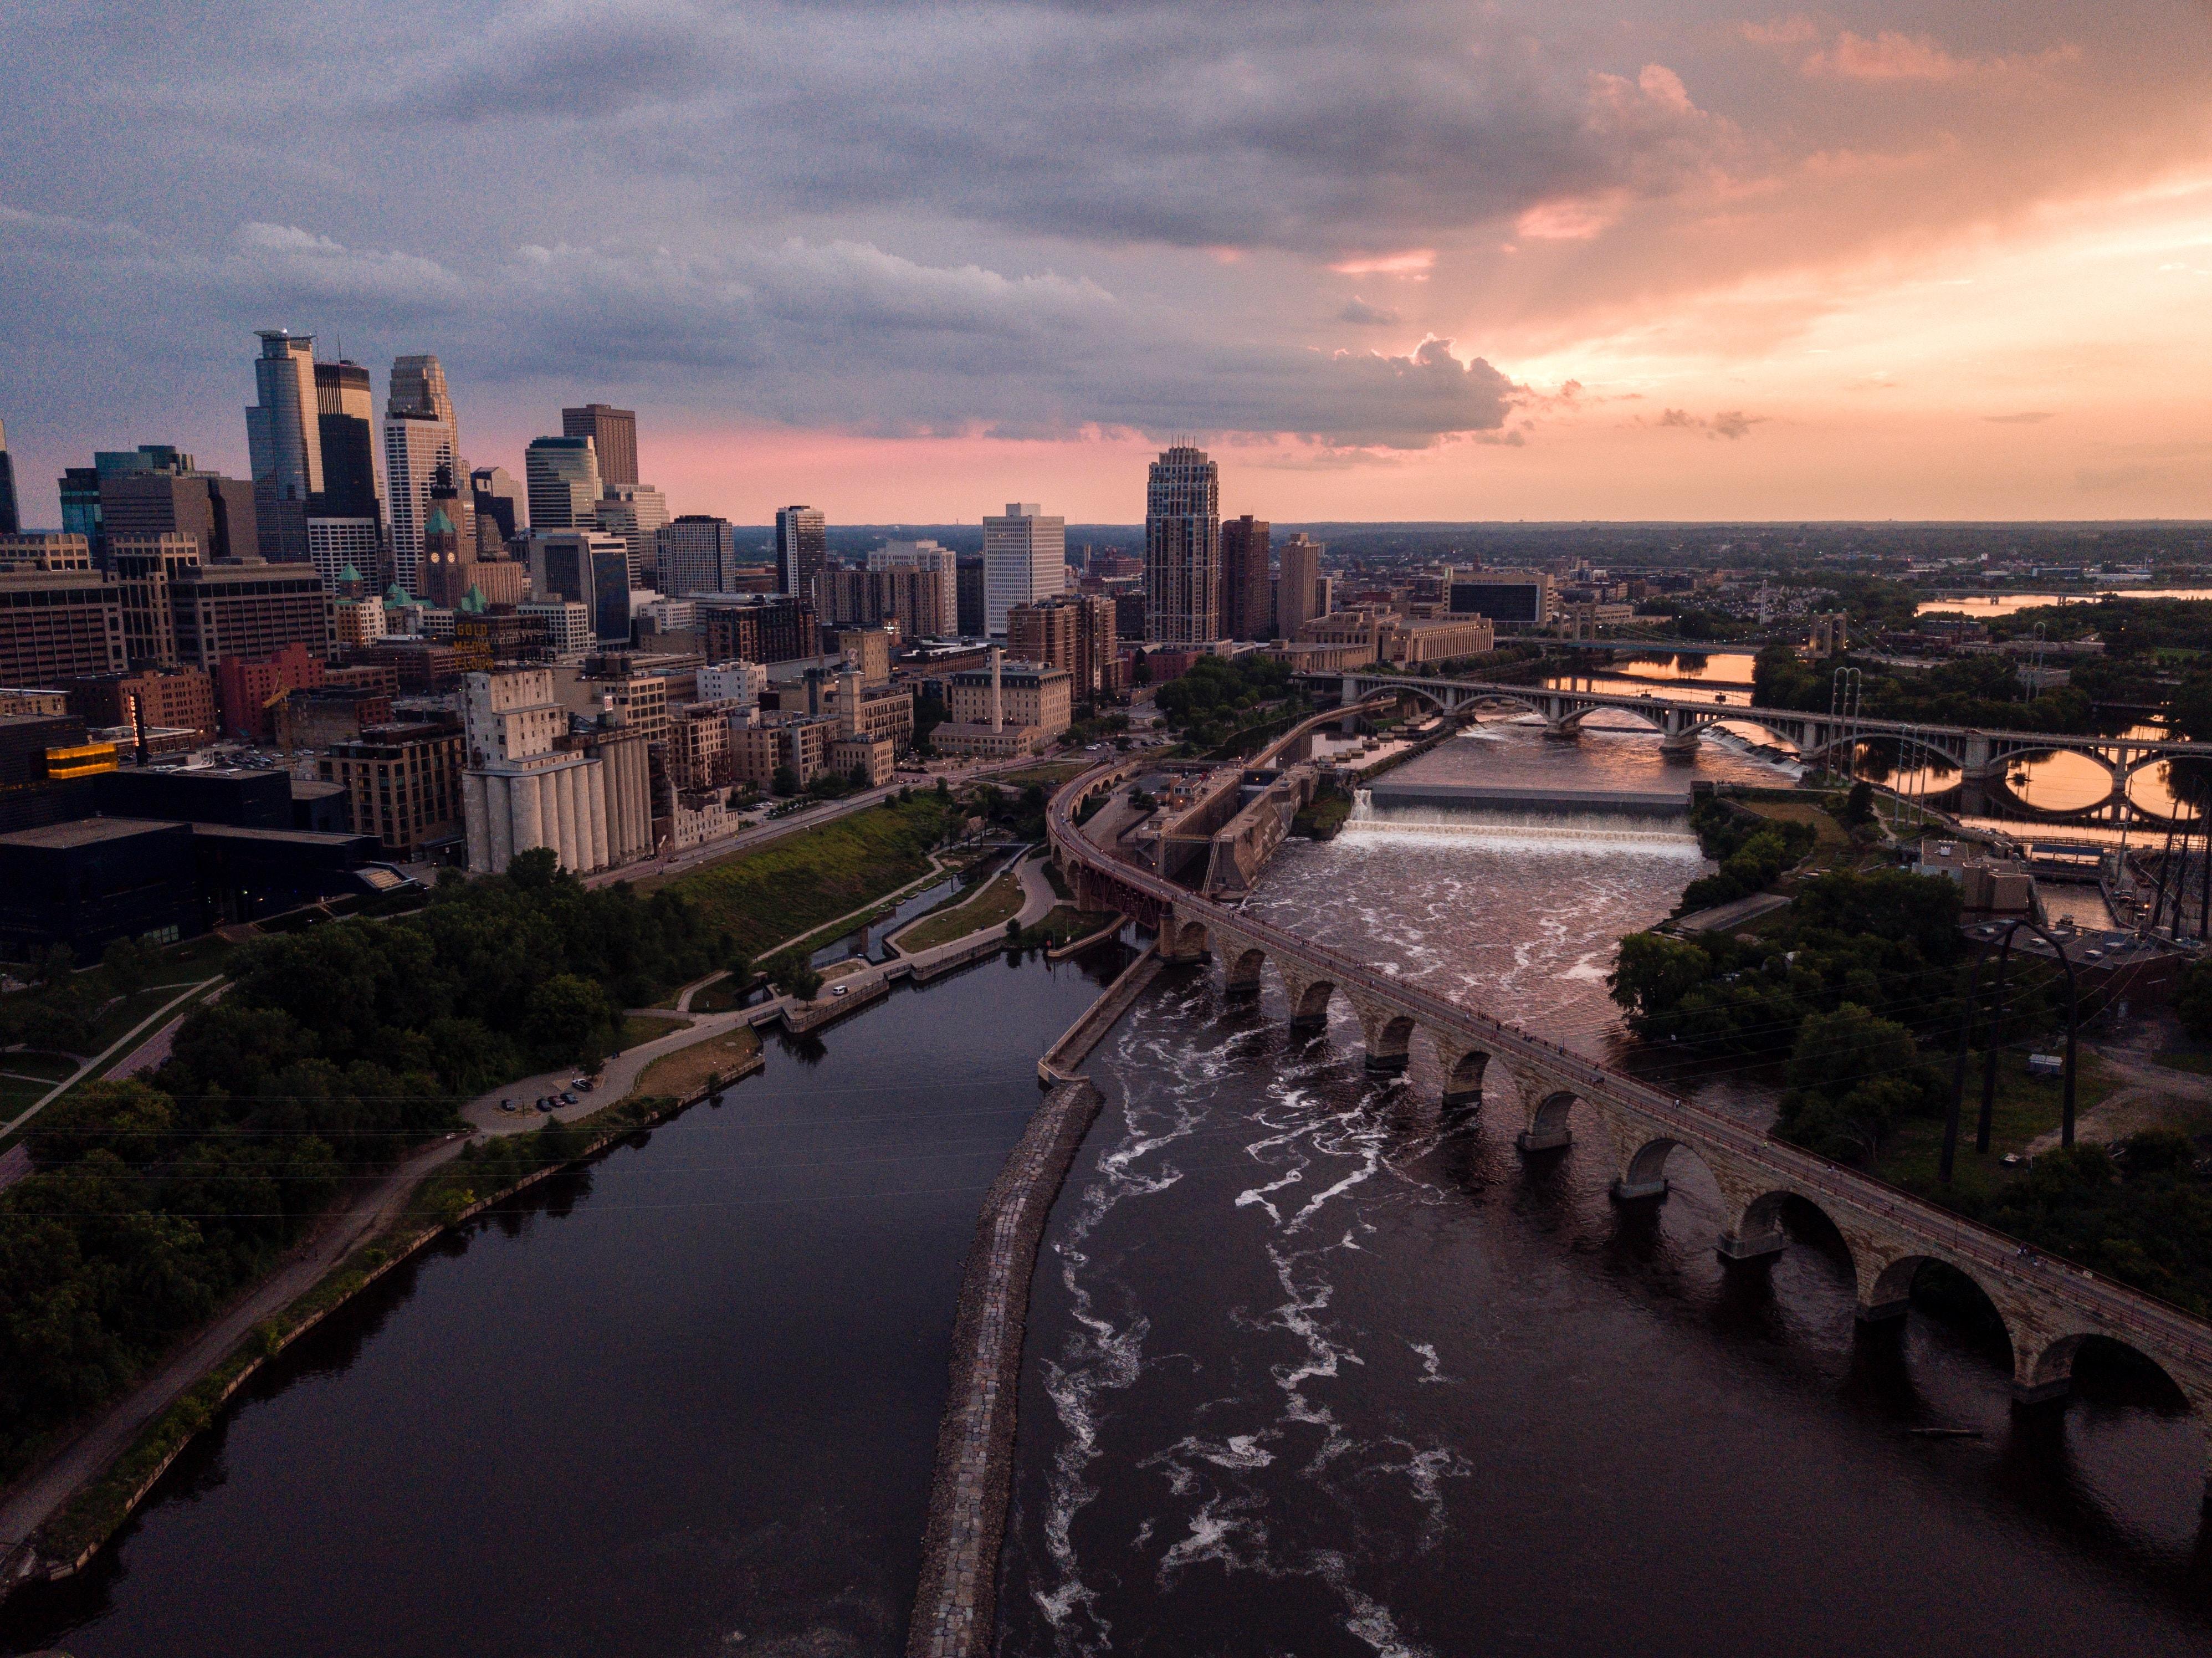 Aerial view of Minneapolis. Photo by Nicole Geri on Unsplash.com.